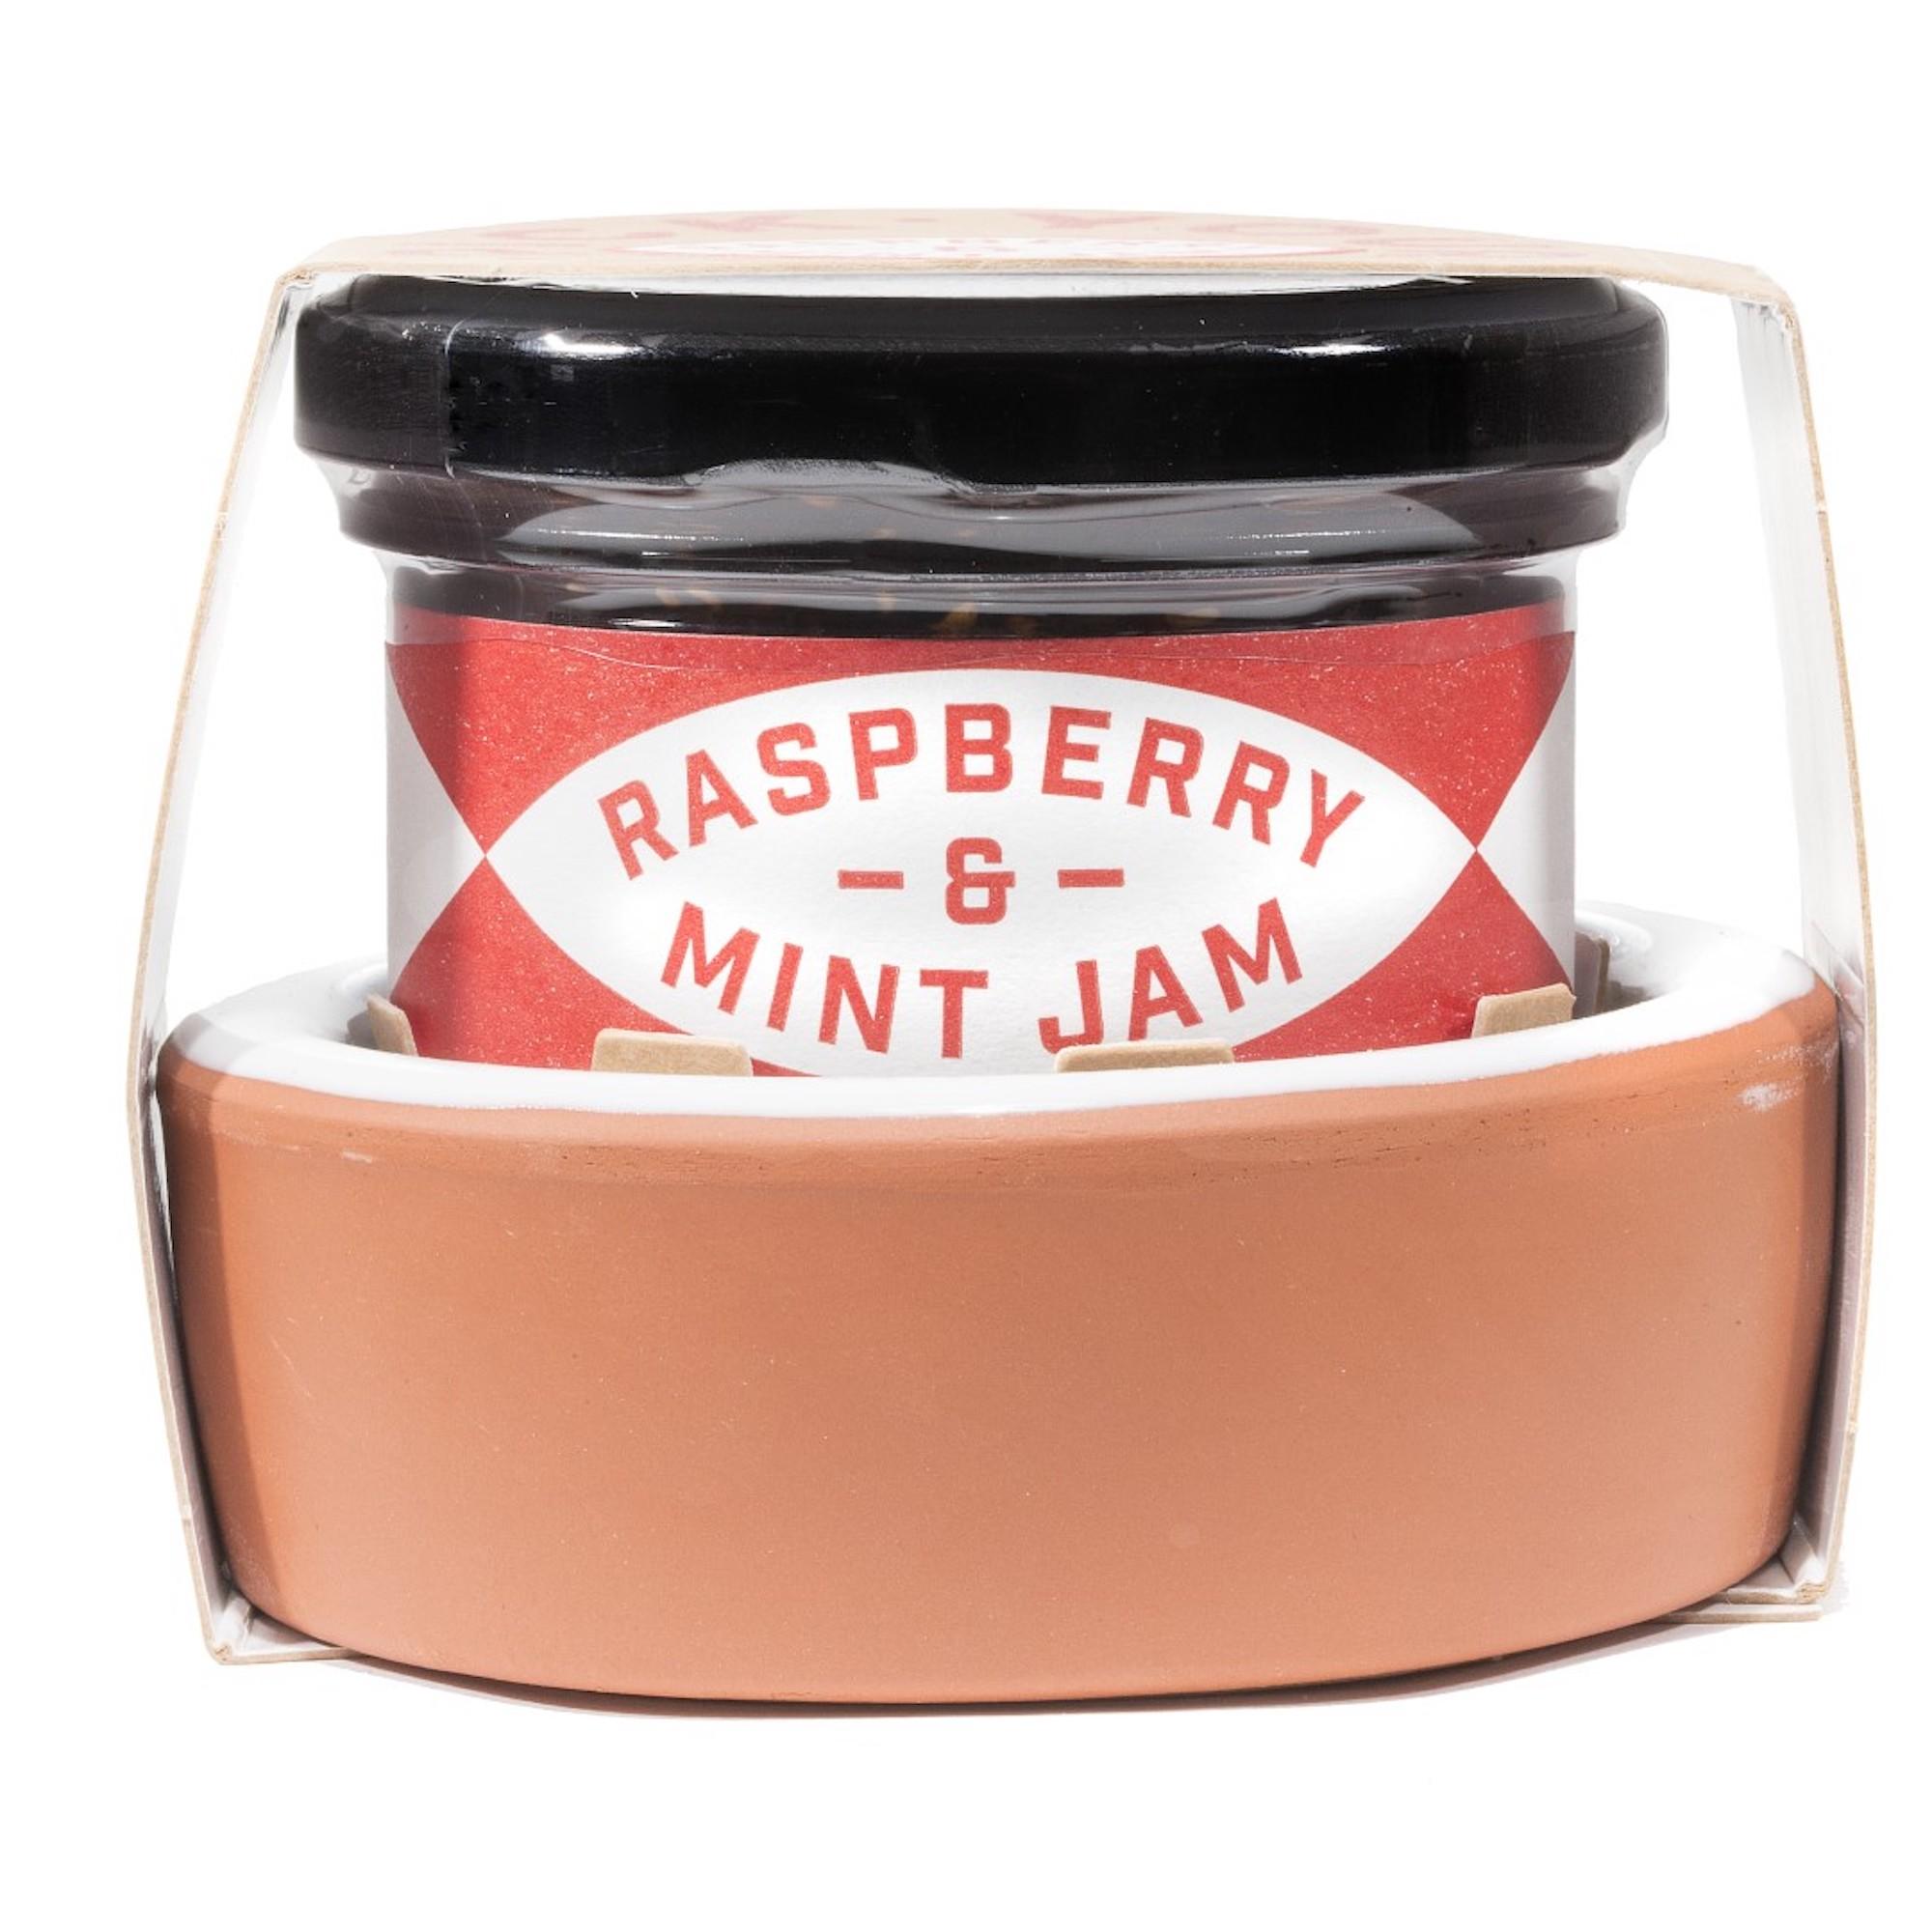 Raspberry & Mint Jam Gift Set by Makers & Merchants